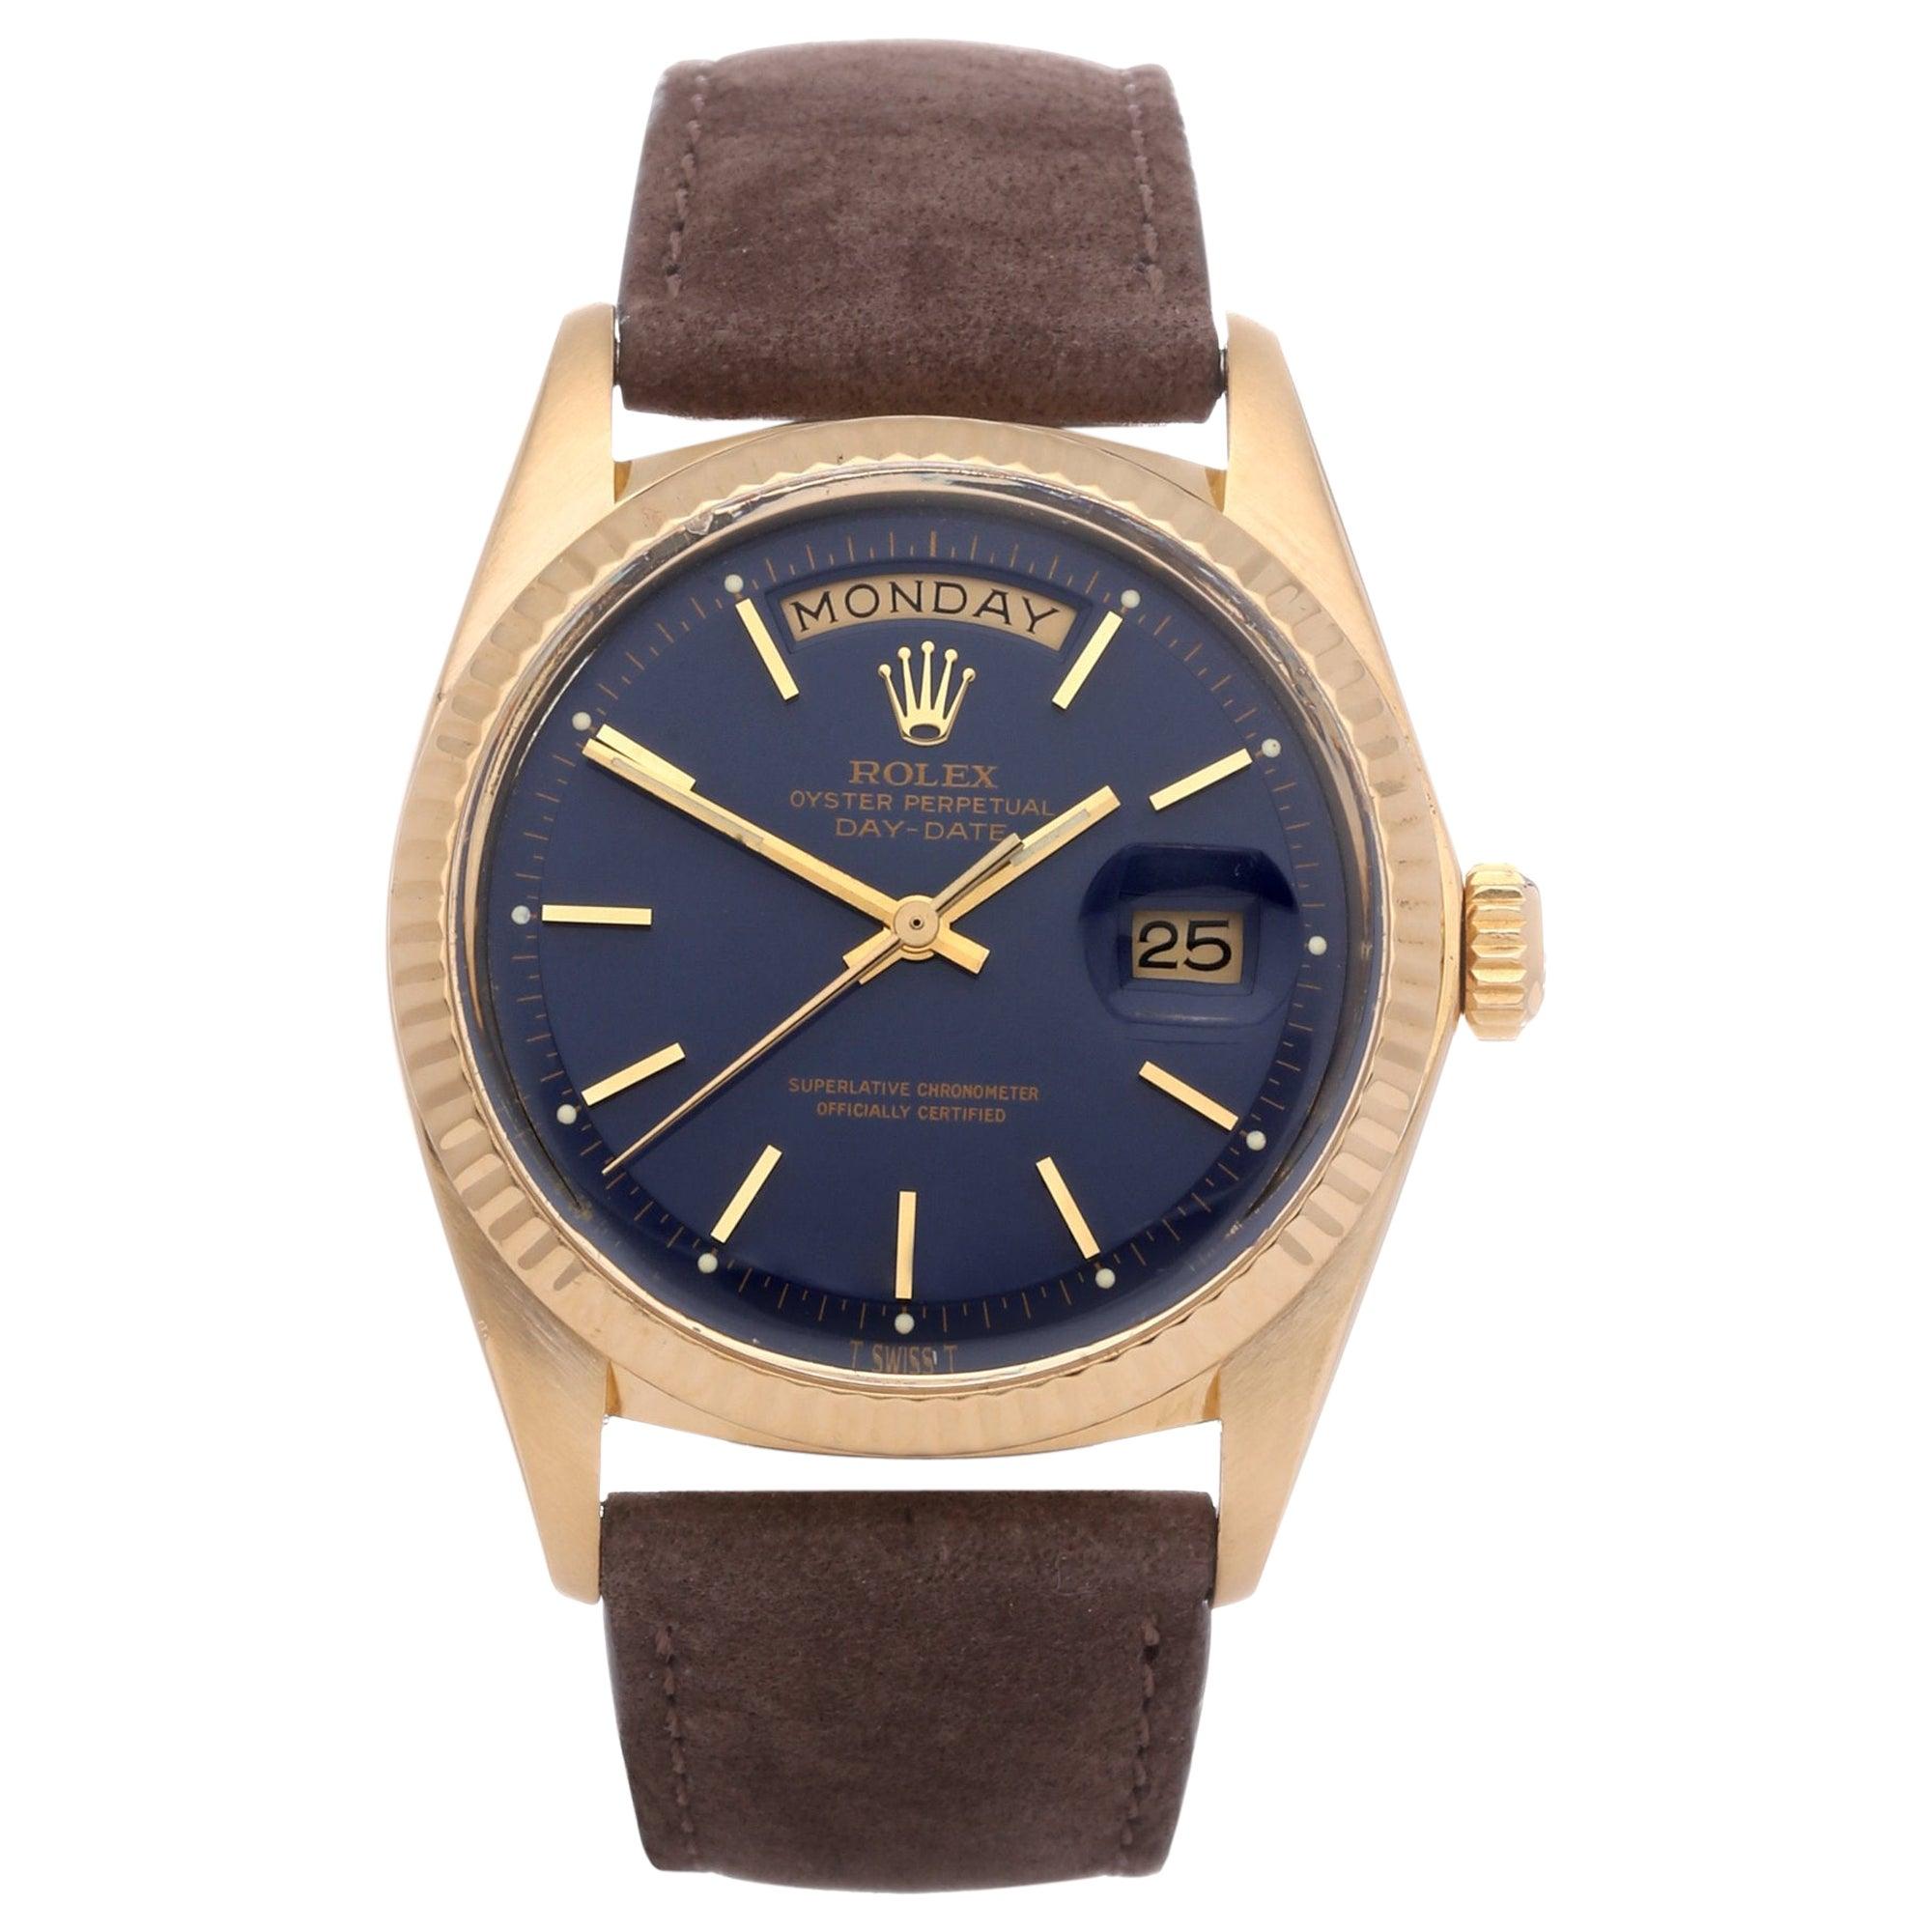 Rolex Day-Date 36 1803 Unisex Yellow Gold Pie Pan Gloss Blue Watch